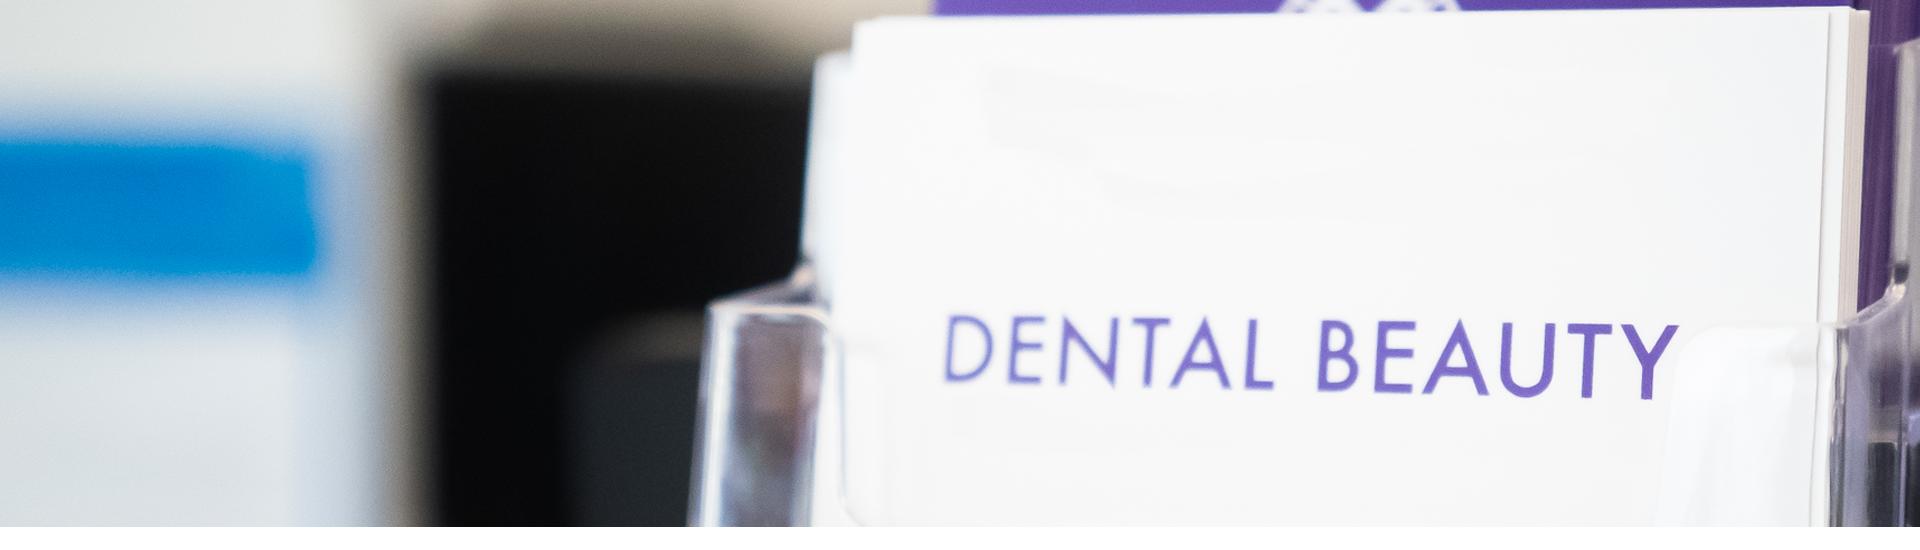 dental beauty dental referrals